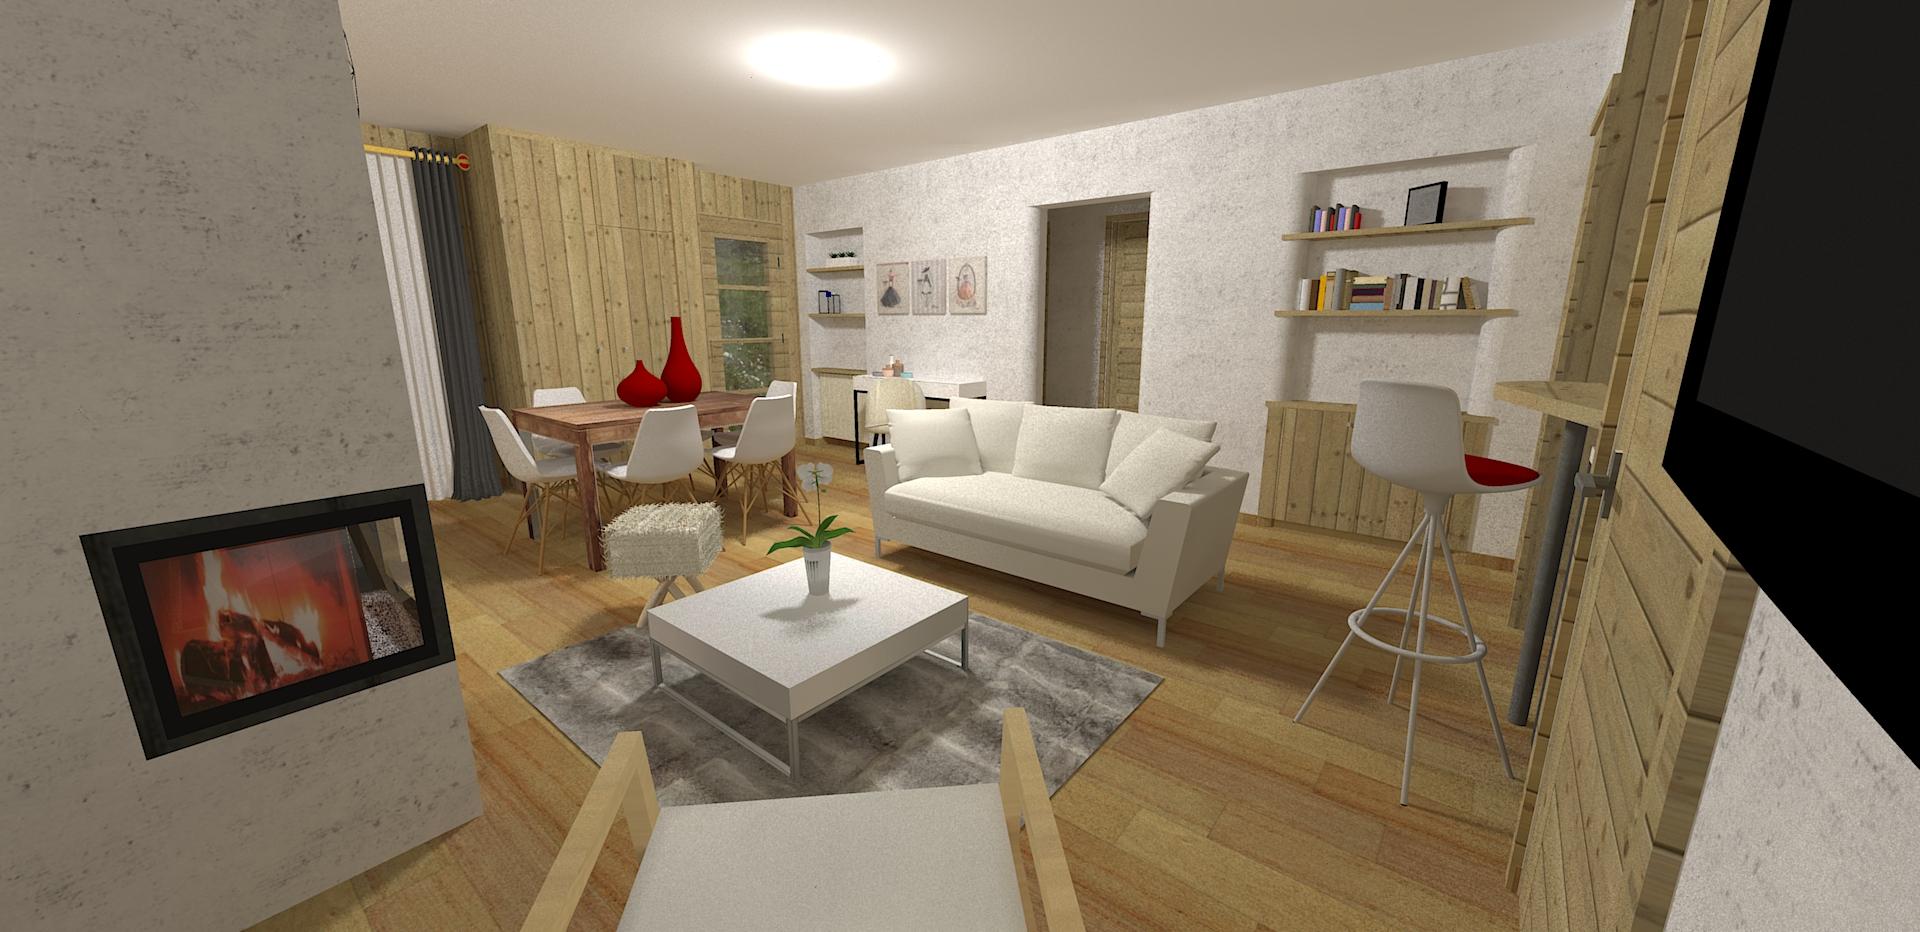 l 39 apr s ski meg ve janvier 2017 aura projets d 39 int rieur. Black Bedroom Furniture Sets. Home Design Ideas